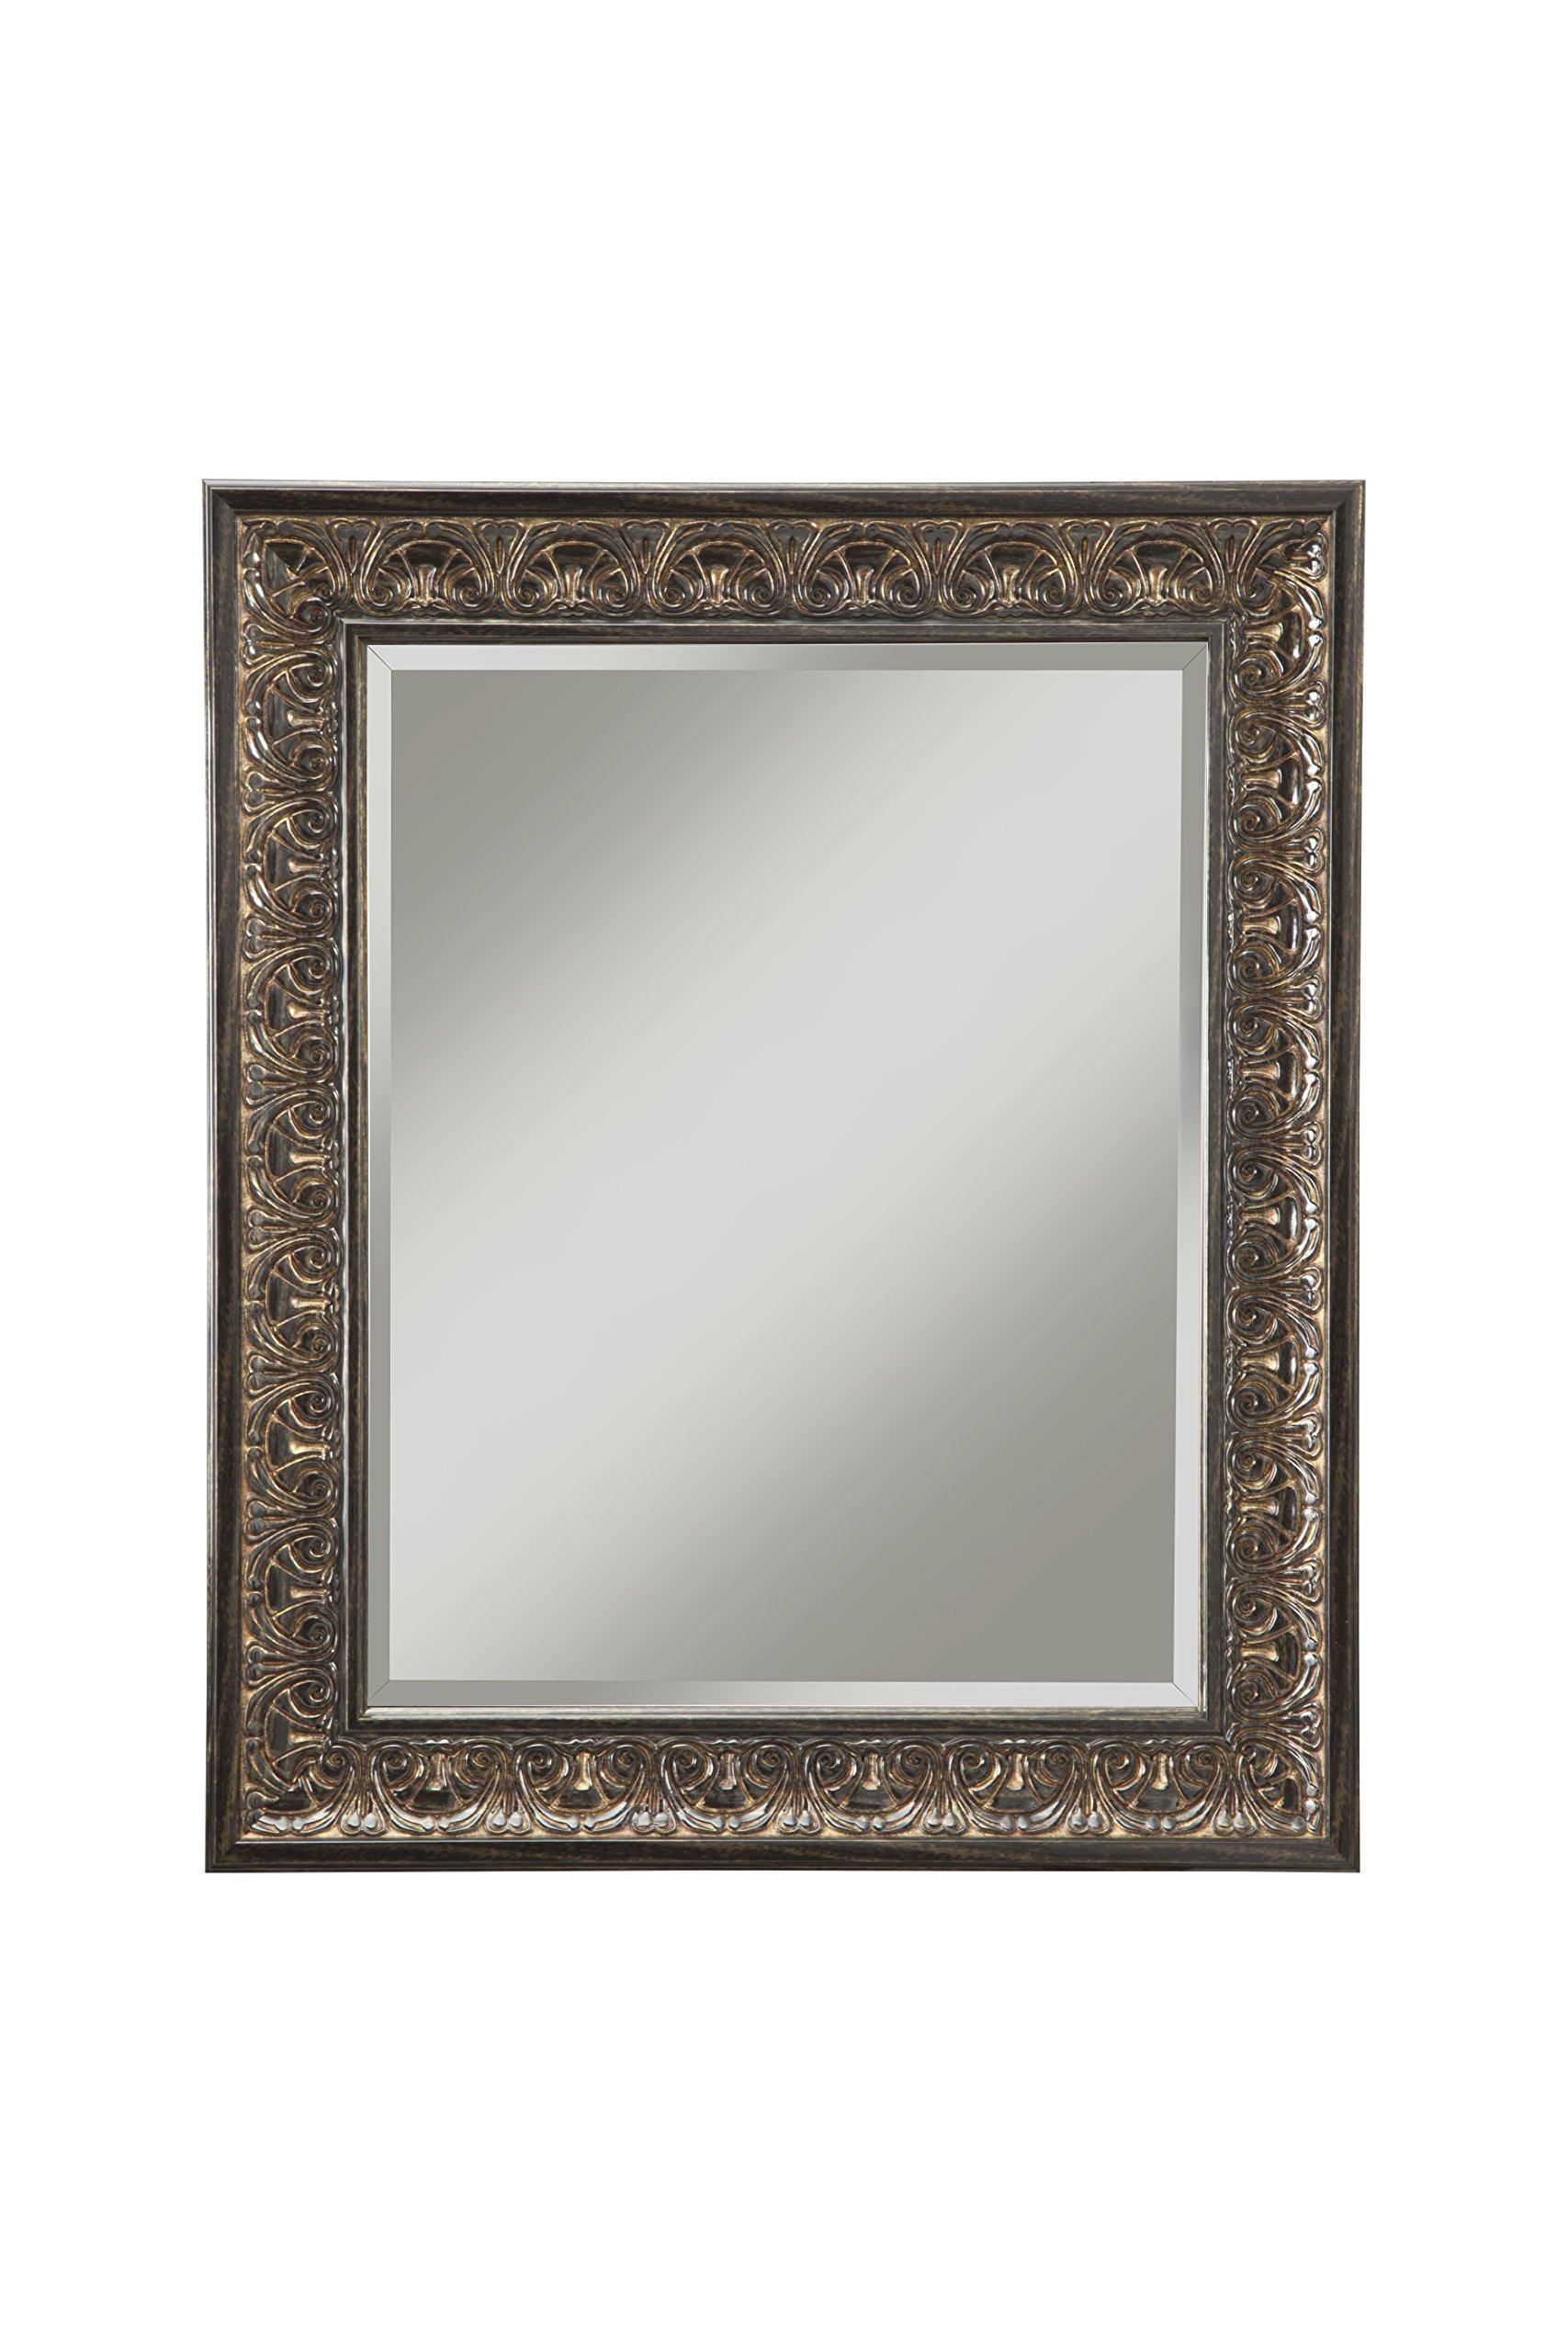 Sandberg Furniture 35517 Andorra Wall Mirror, 36'' x 30'' Wall Mirror, Cognac Ash